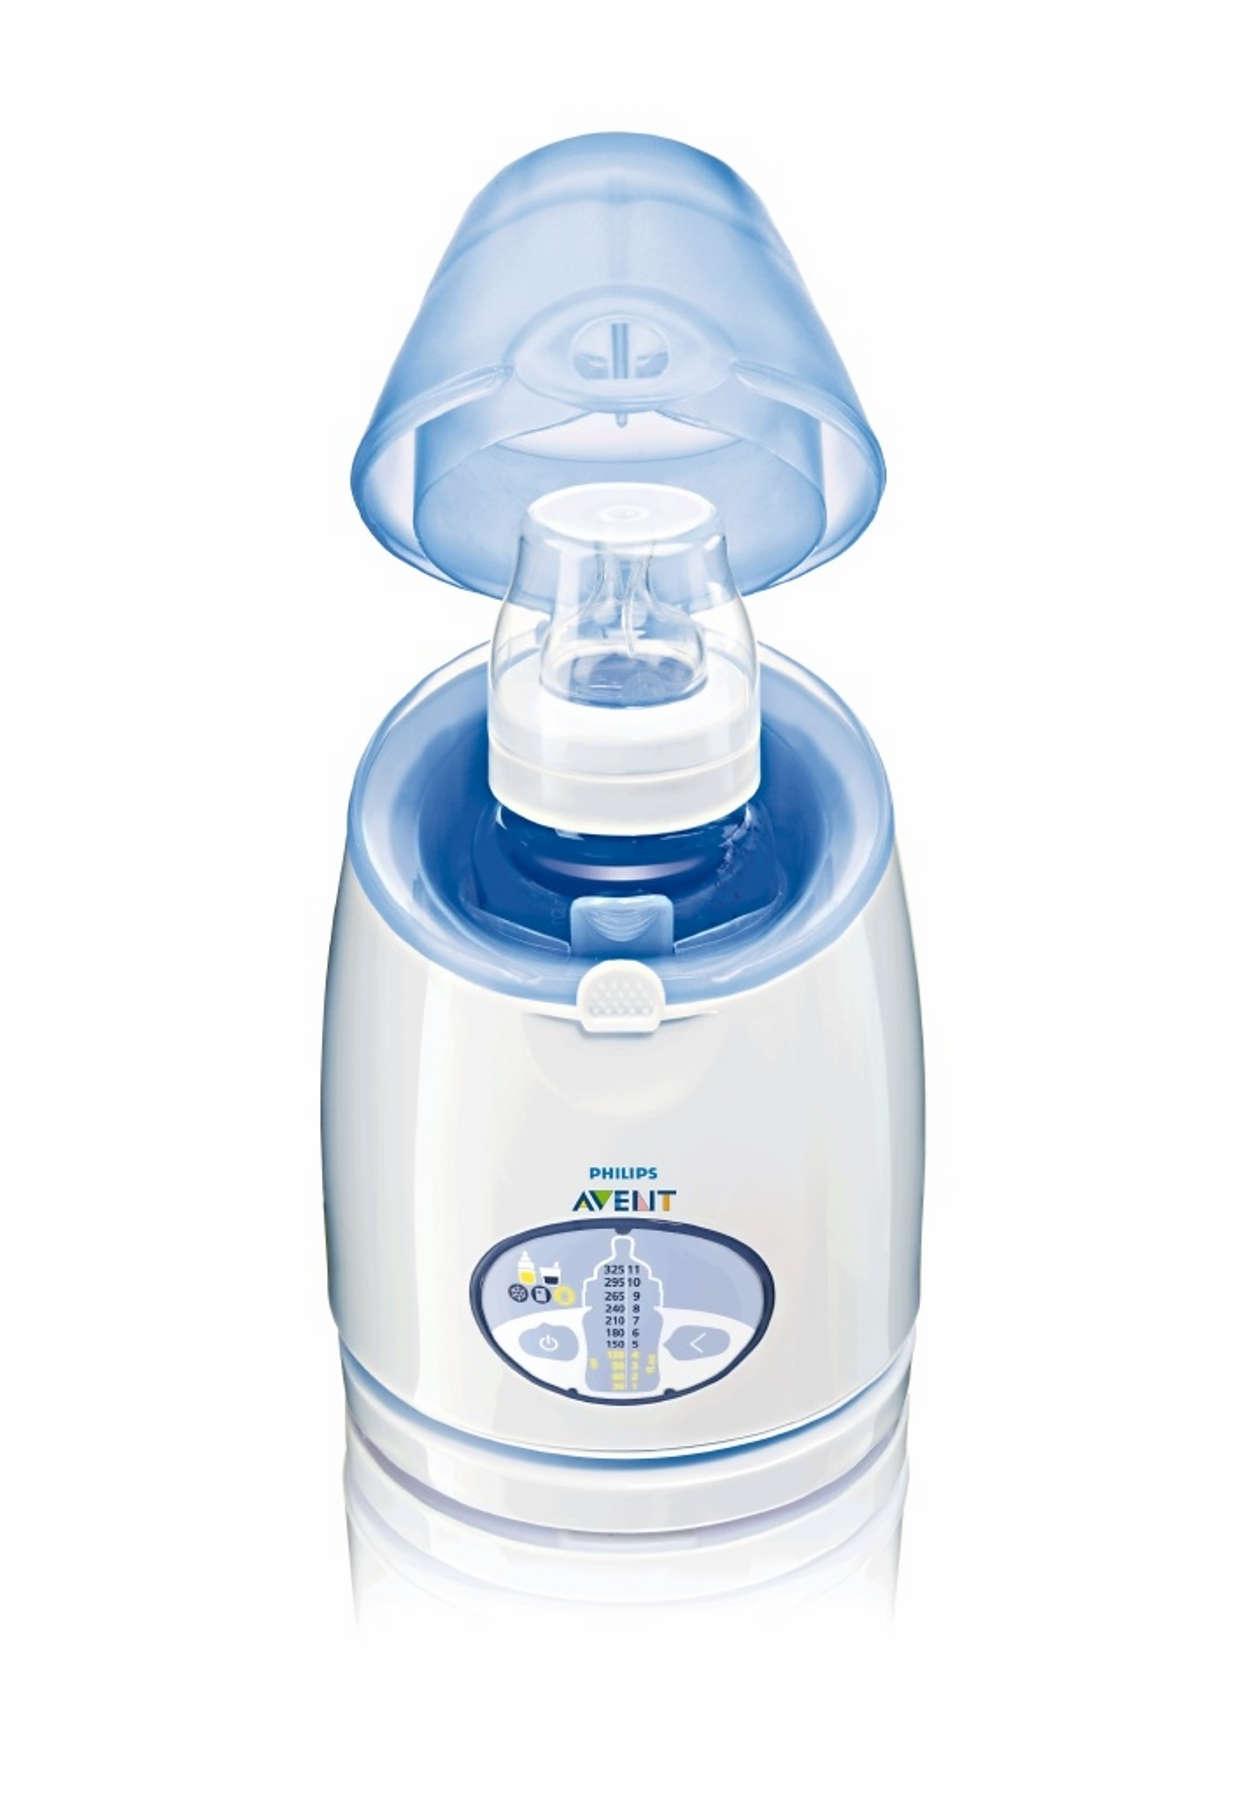 Digital Bottle Warmer Scf26022 Avent